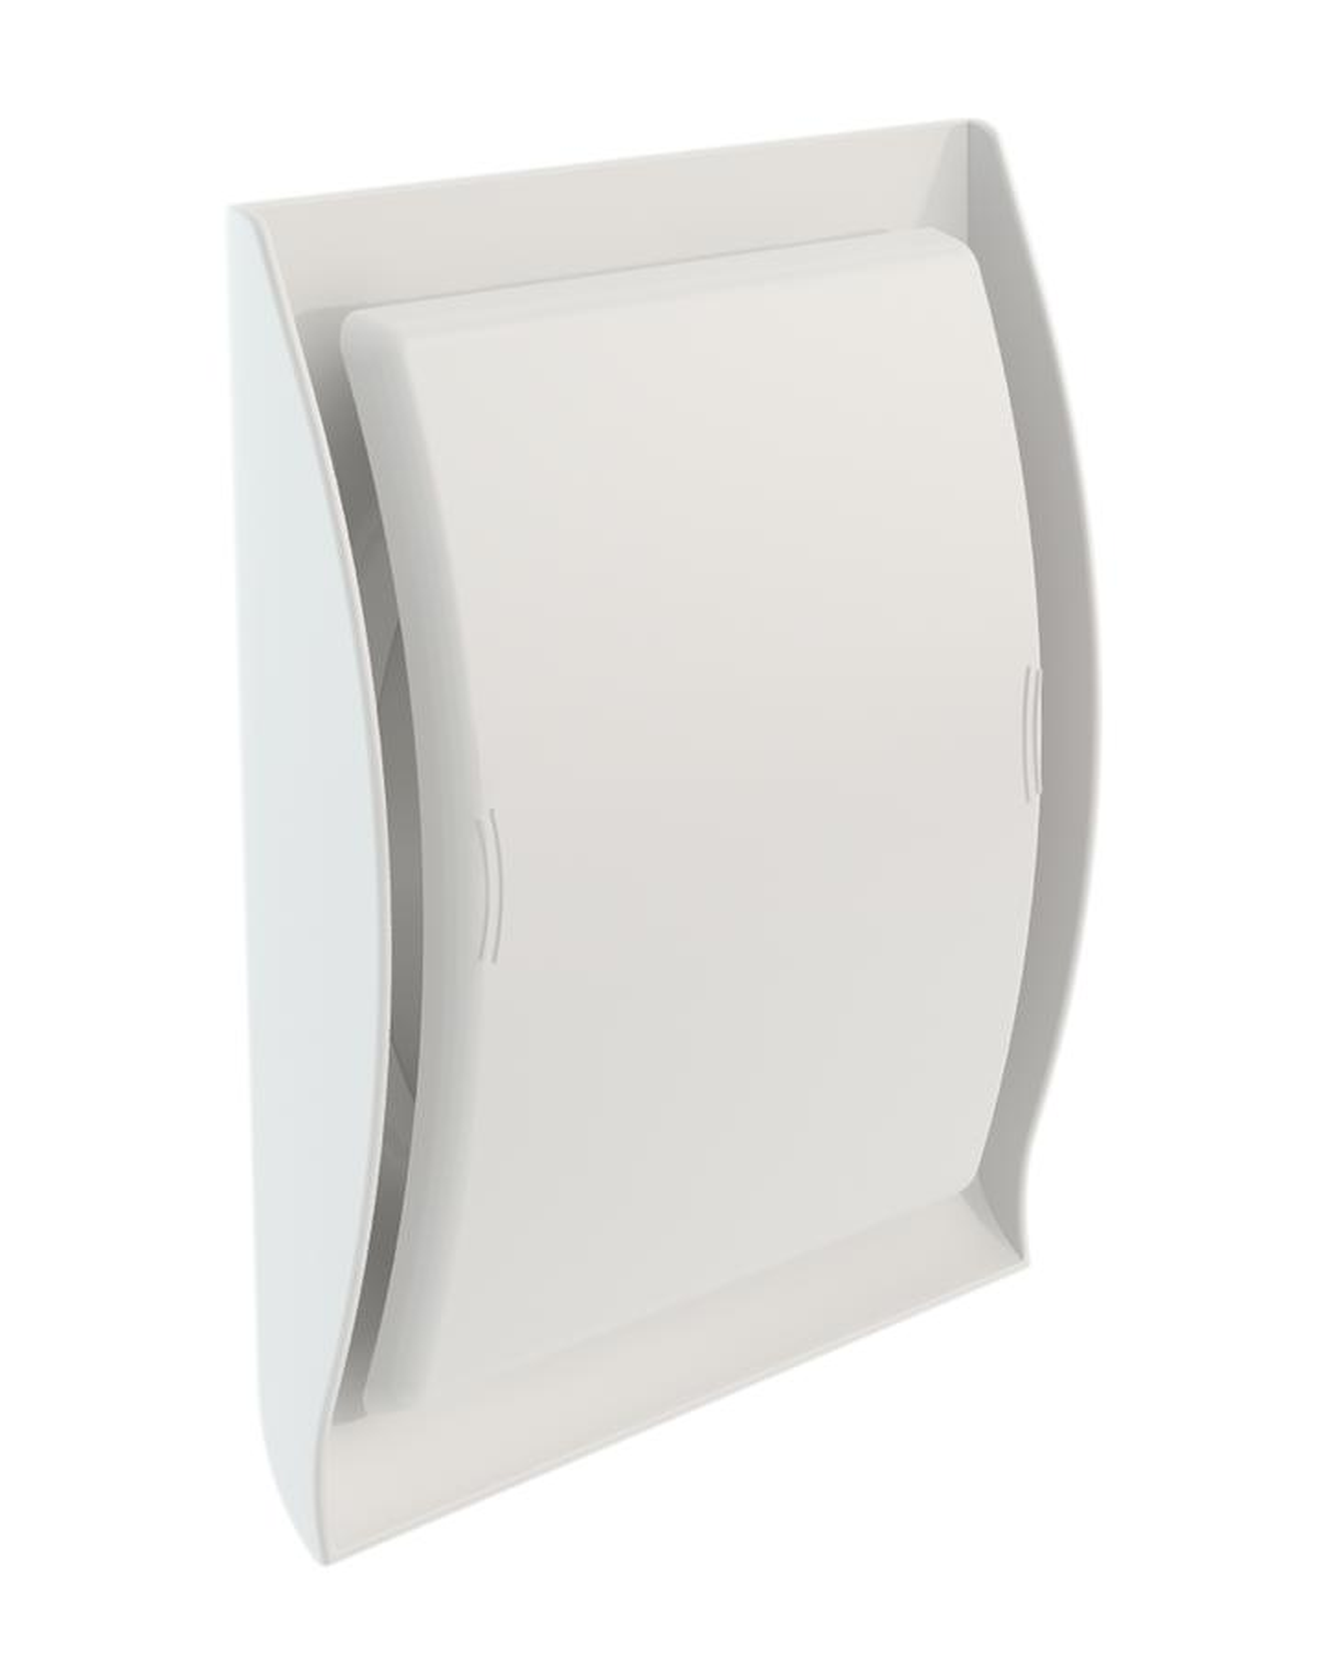 Grille de ventilation NEOLIA Design D.125 Gris anthracite NICOLL